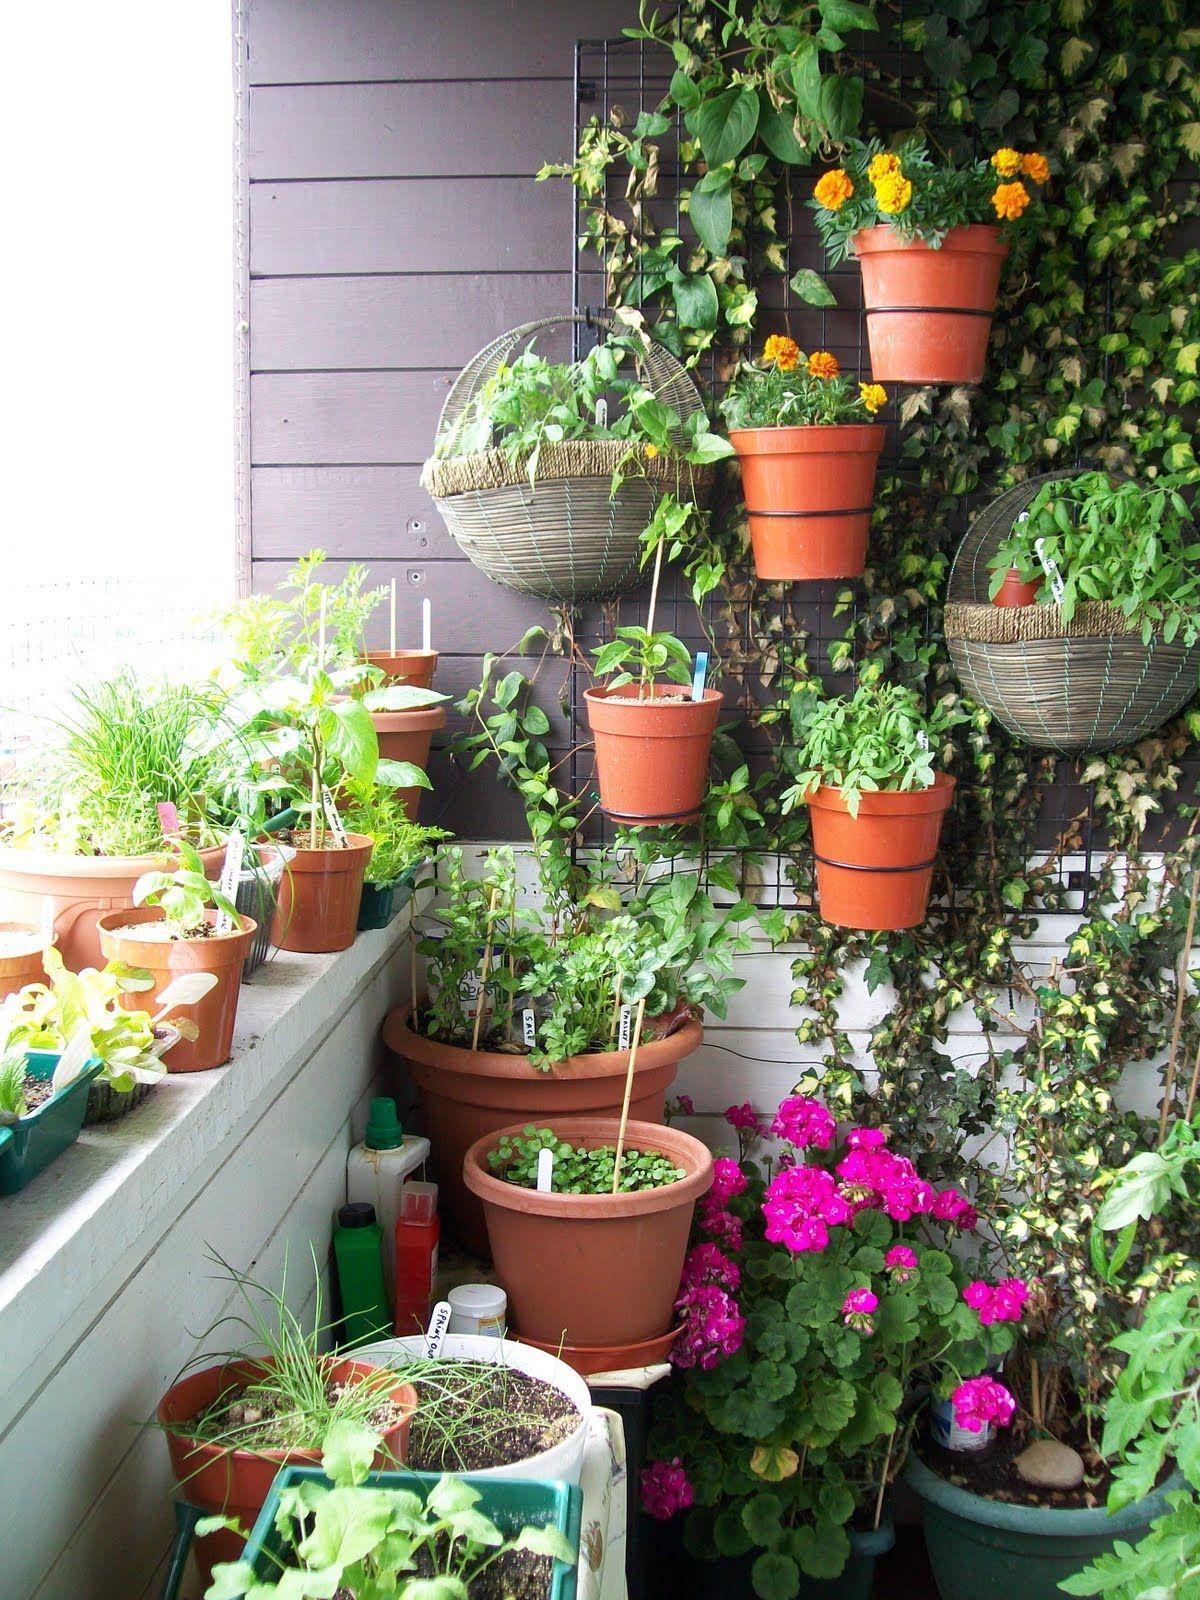 Small Garden Ideas: Beautiful Renovations for Patio or Balcony ...